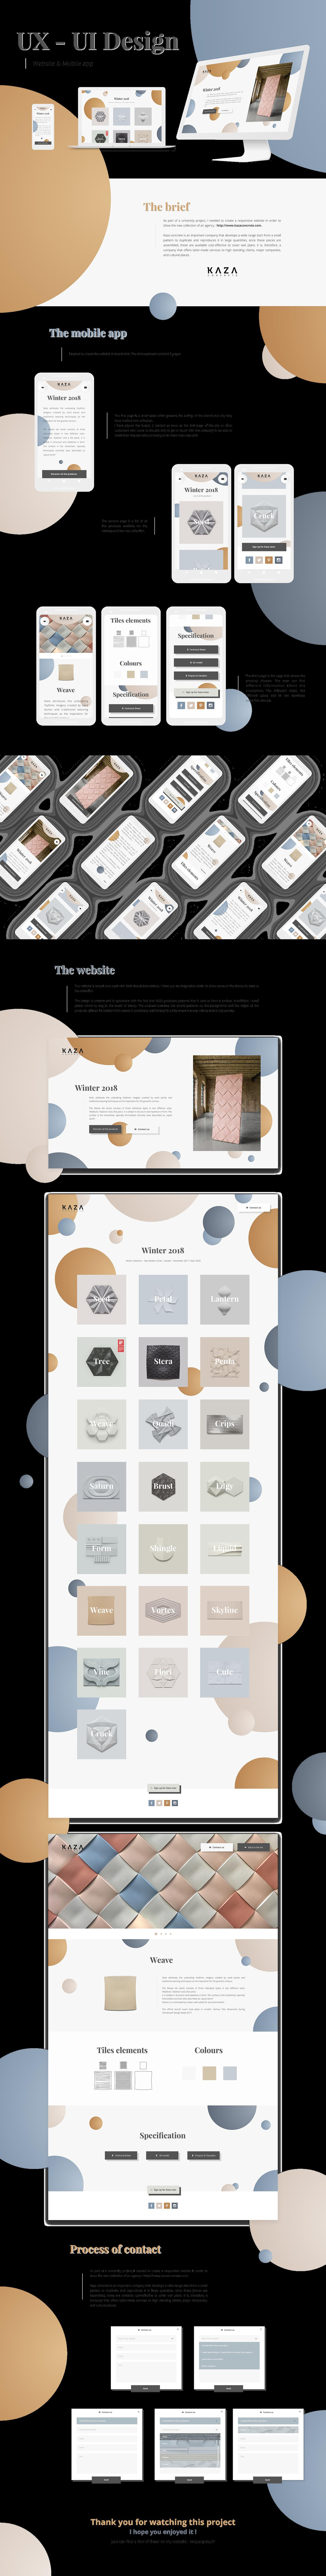 ui design,UX design,gradients,colorful,bright,Fun,Website,concrete,kaza,app